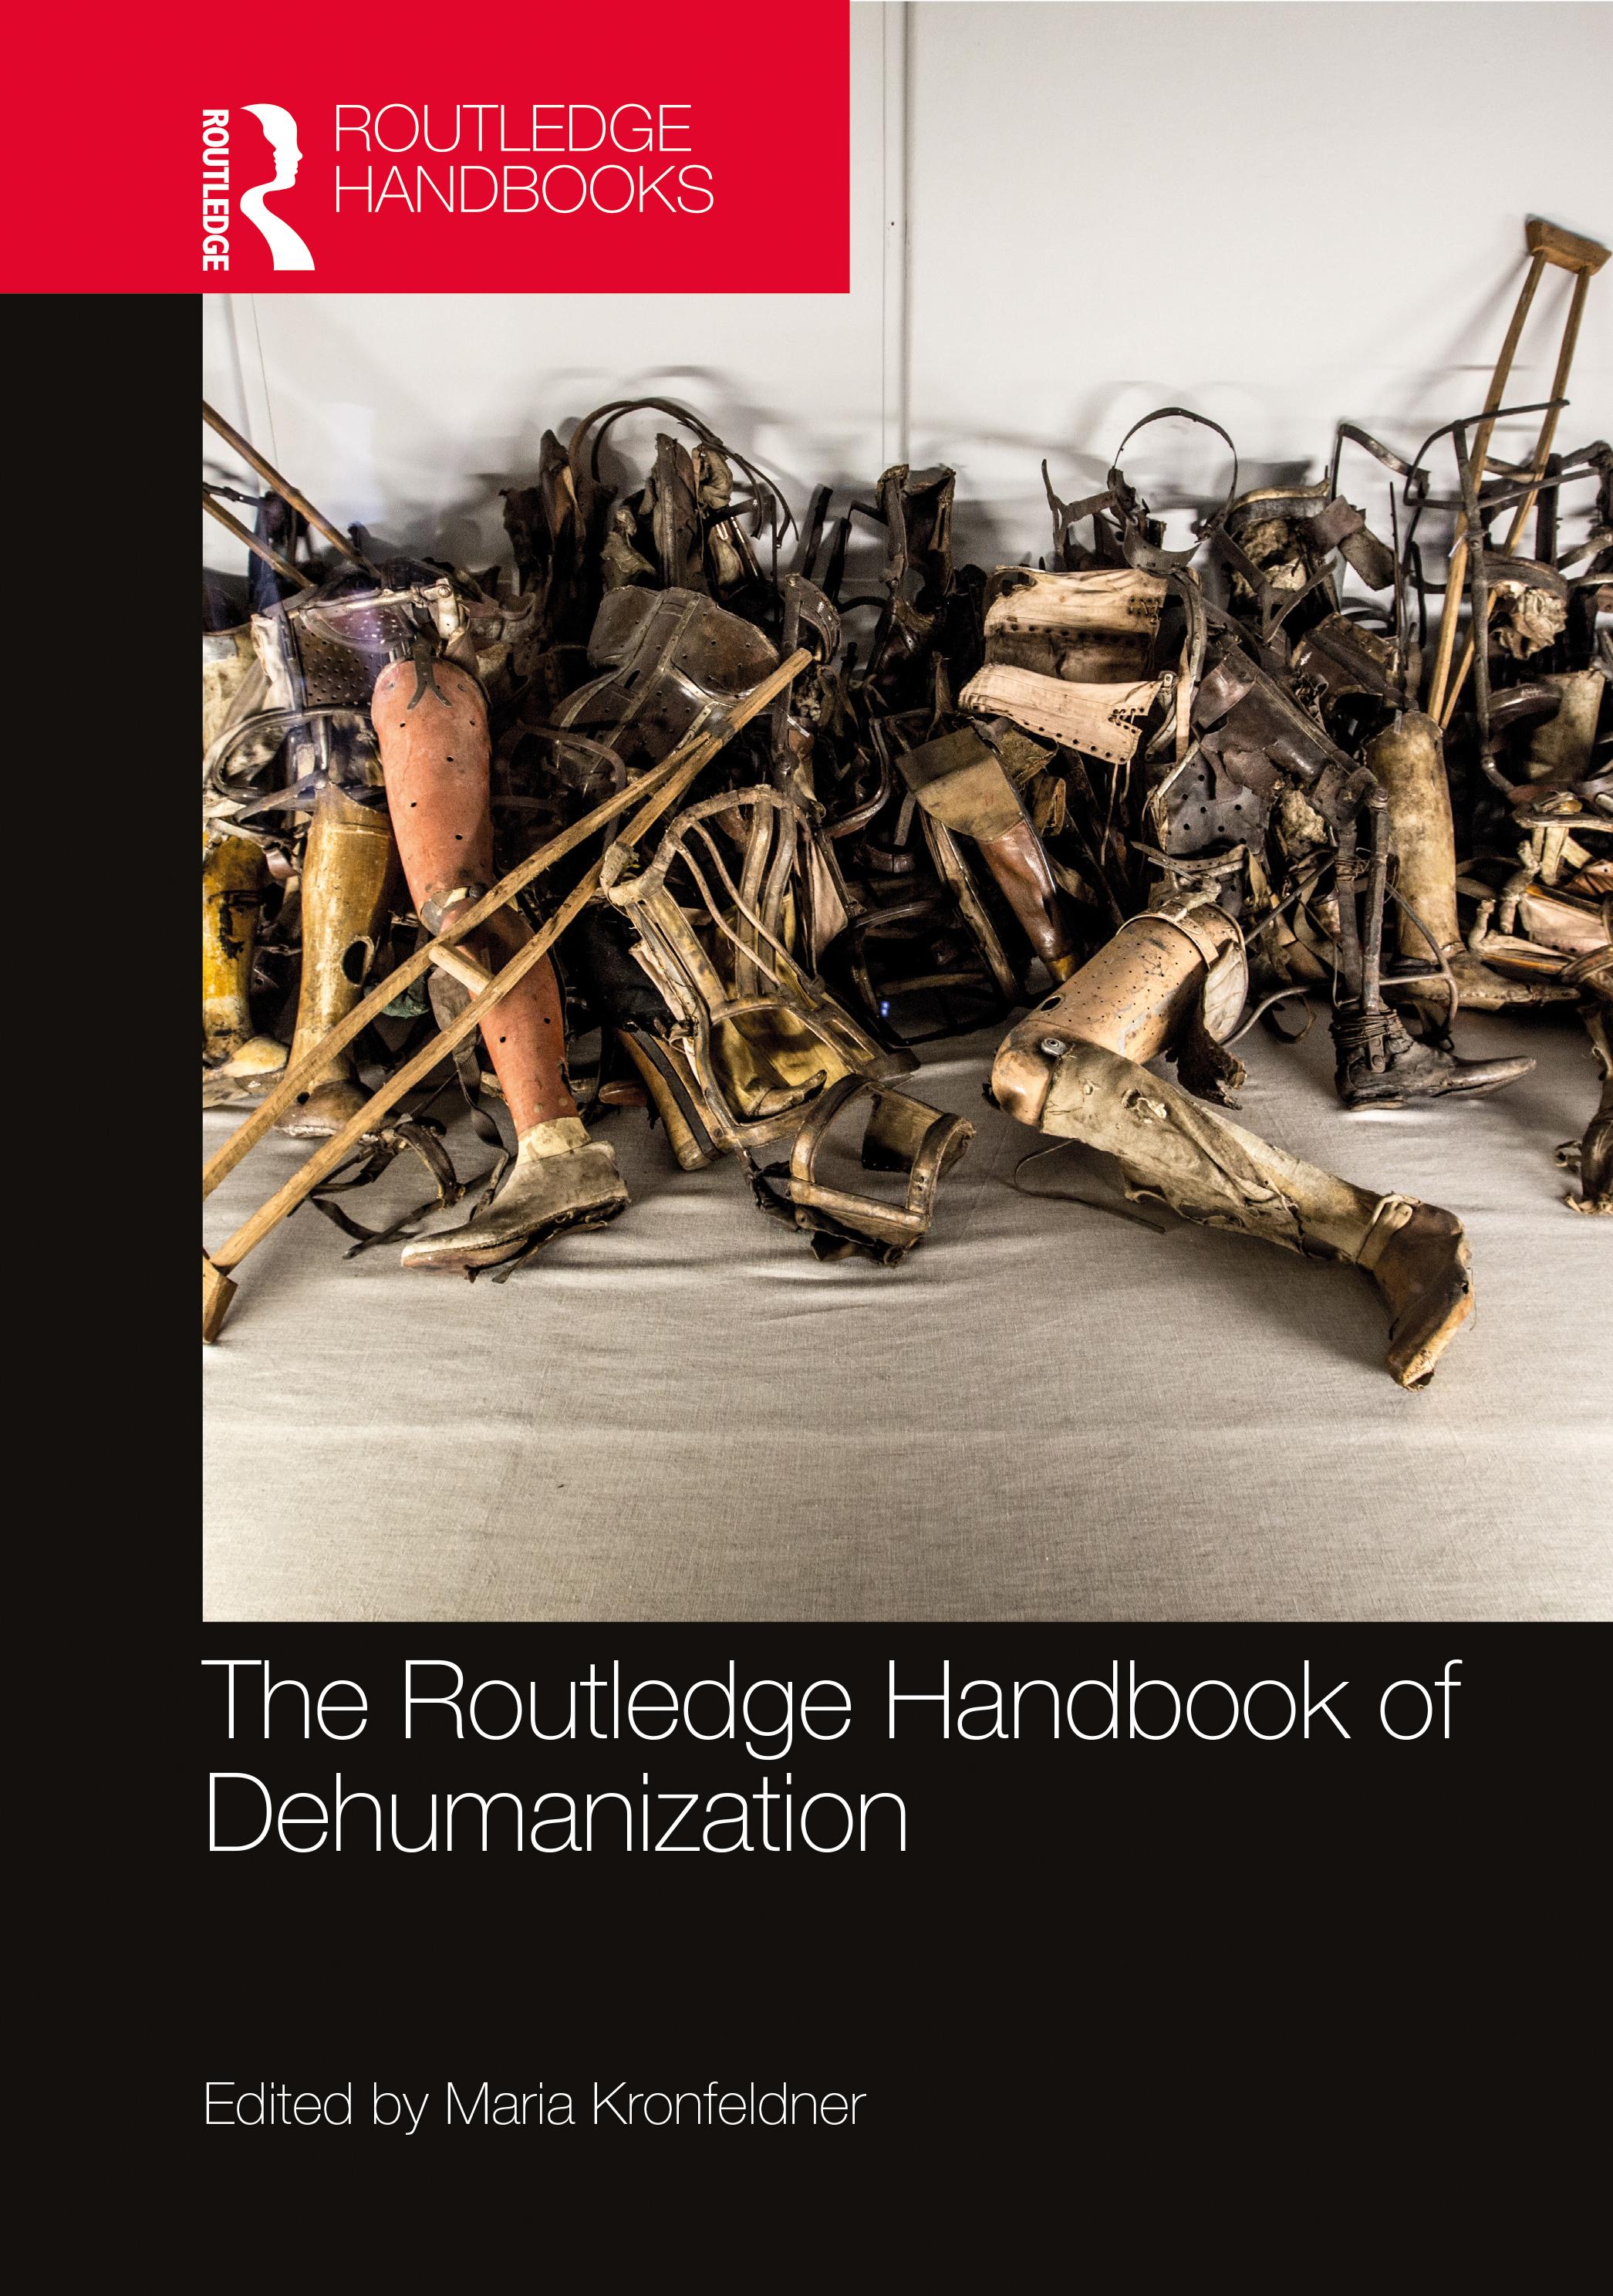 The Routledge Handbook of Dehumanization